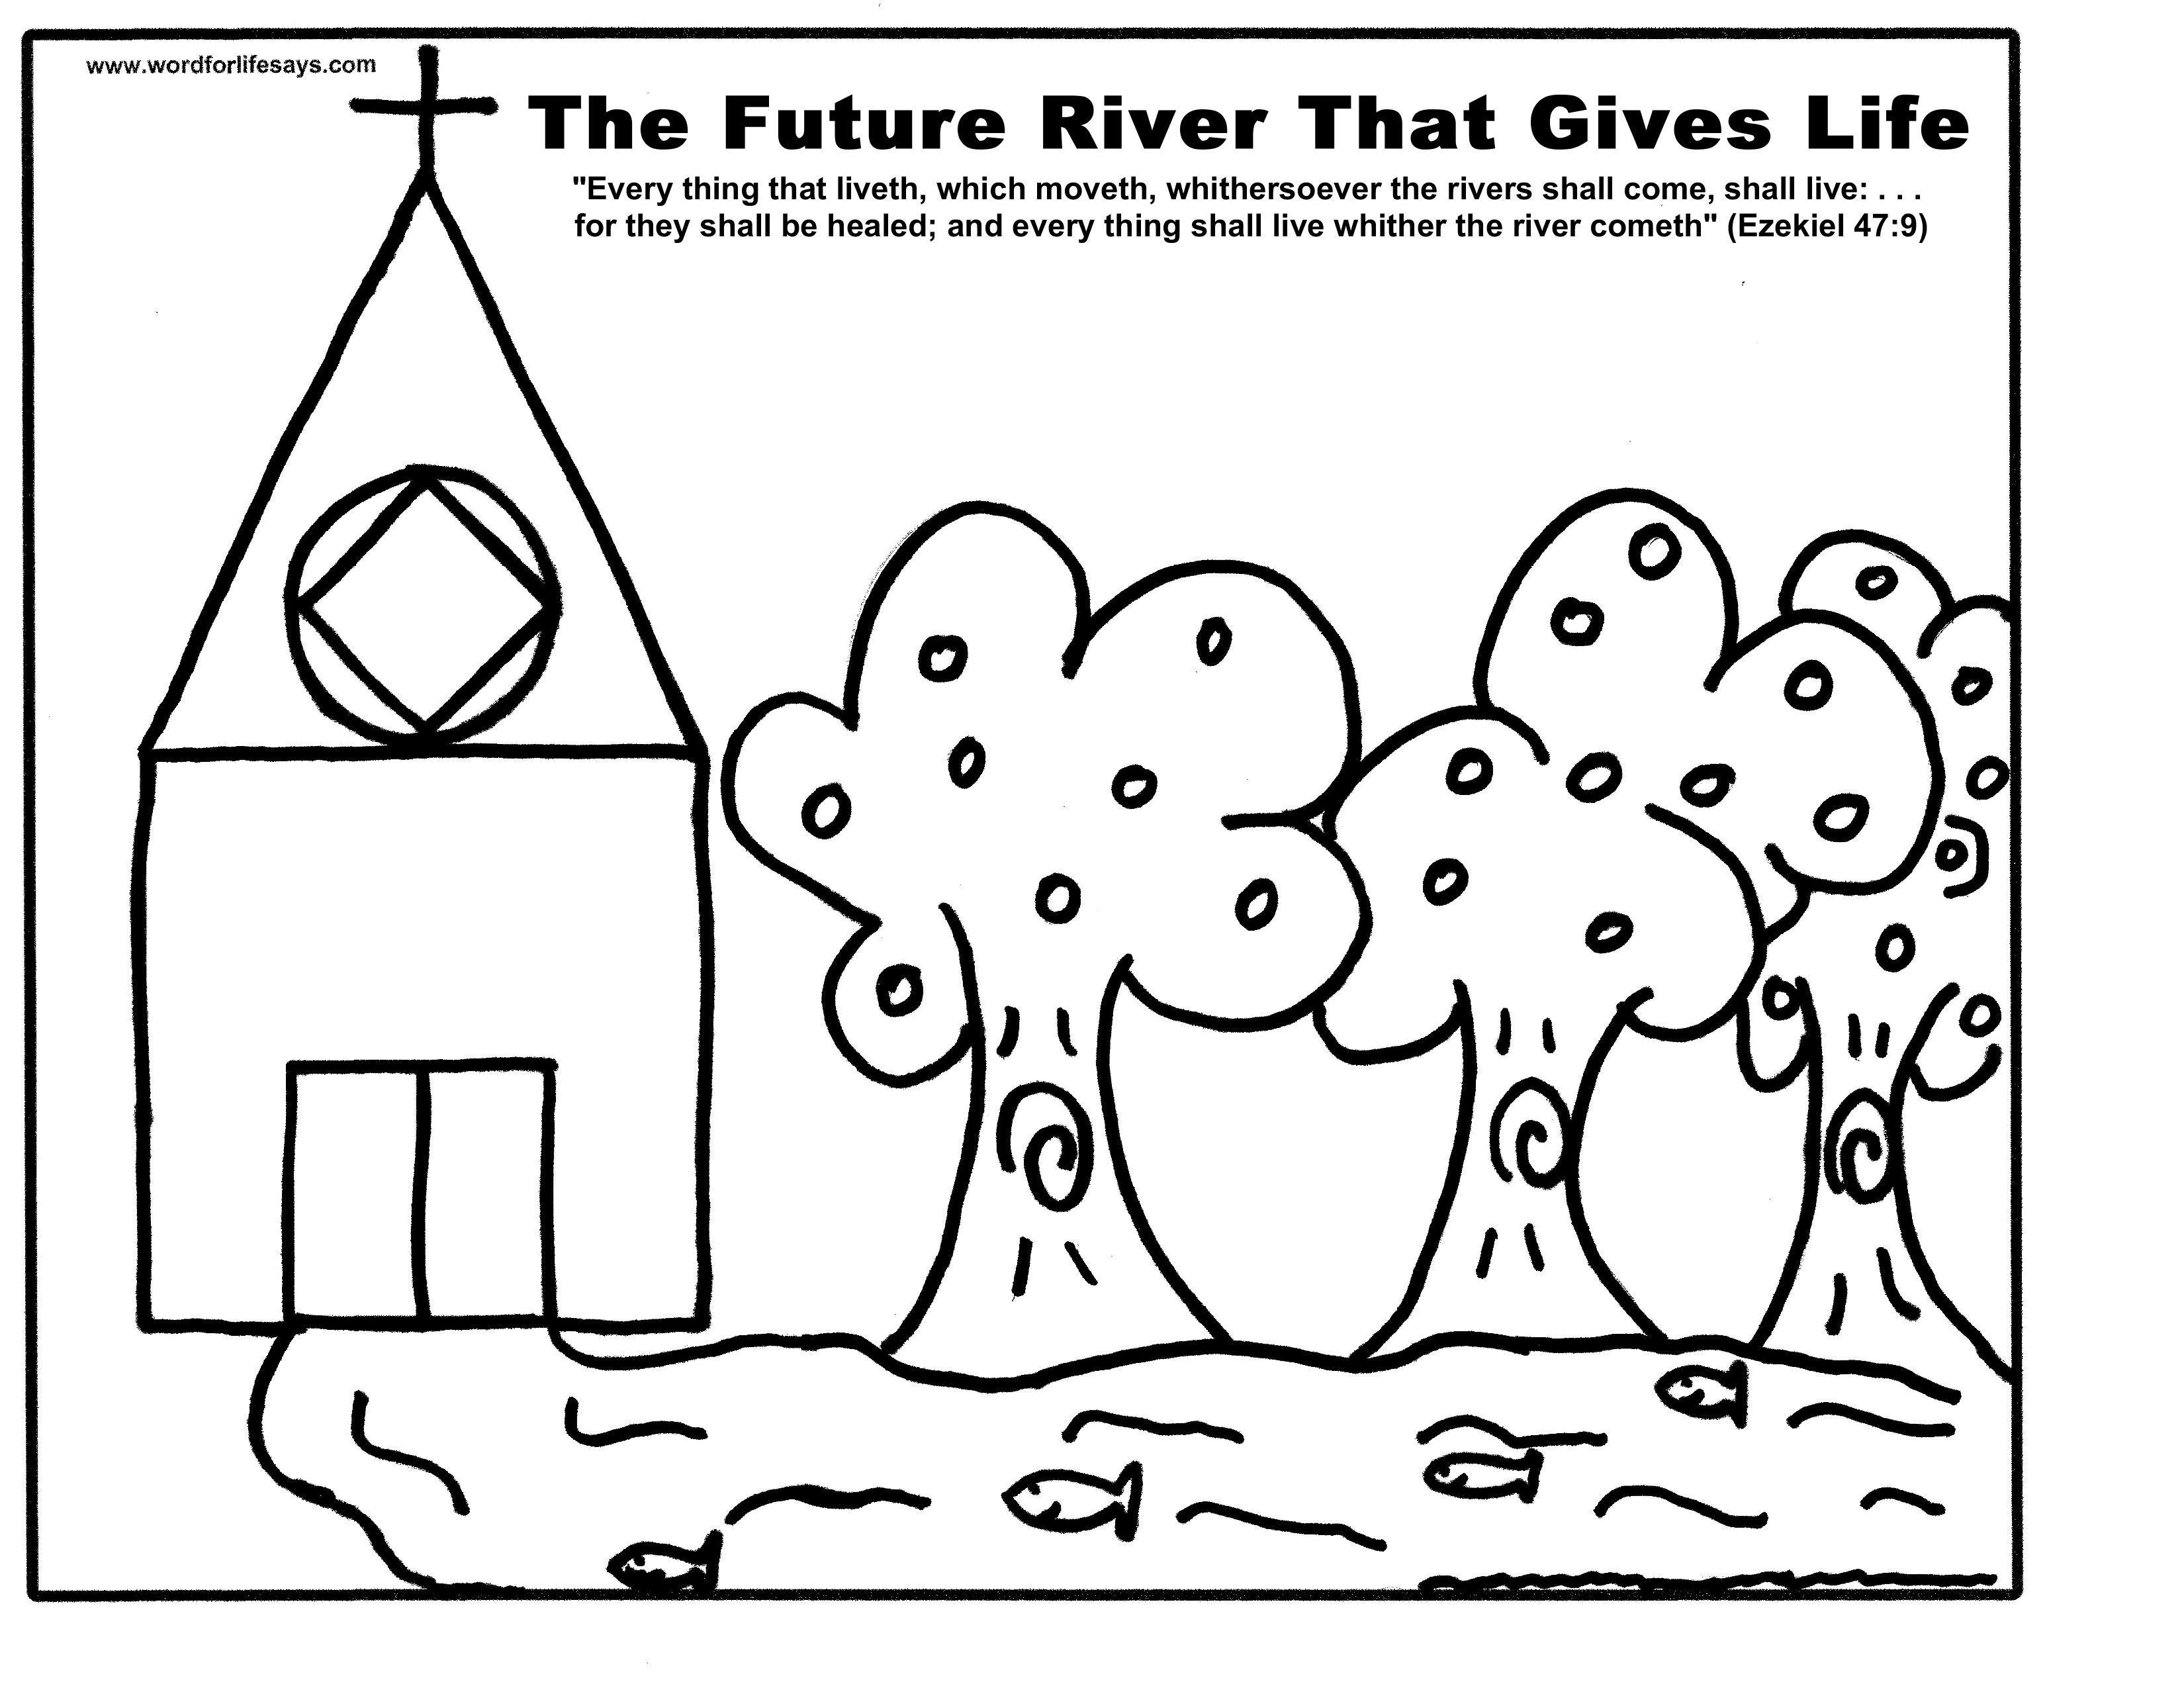 Ezekiel 47 9 Coloring Sheet For Kids